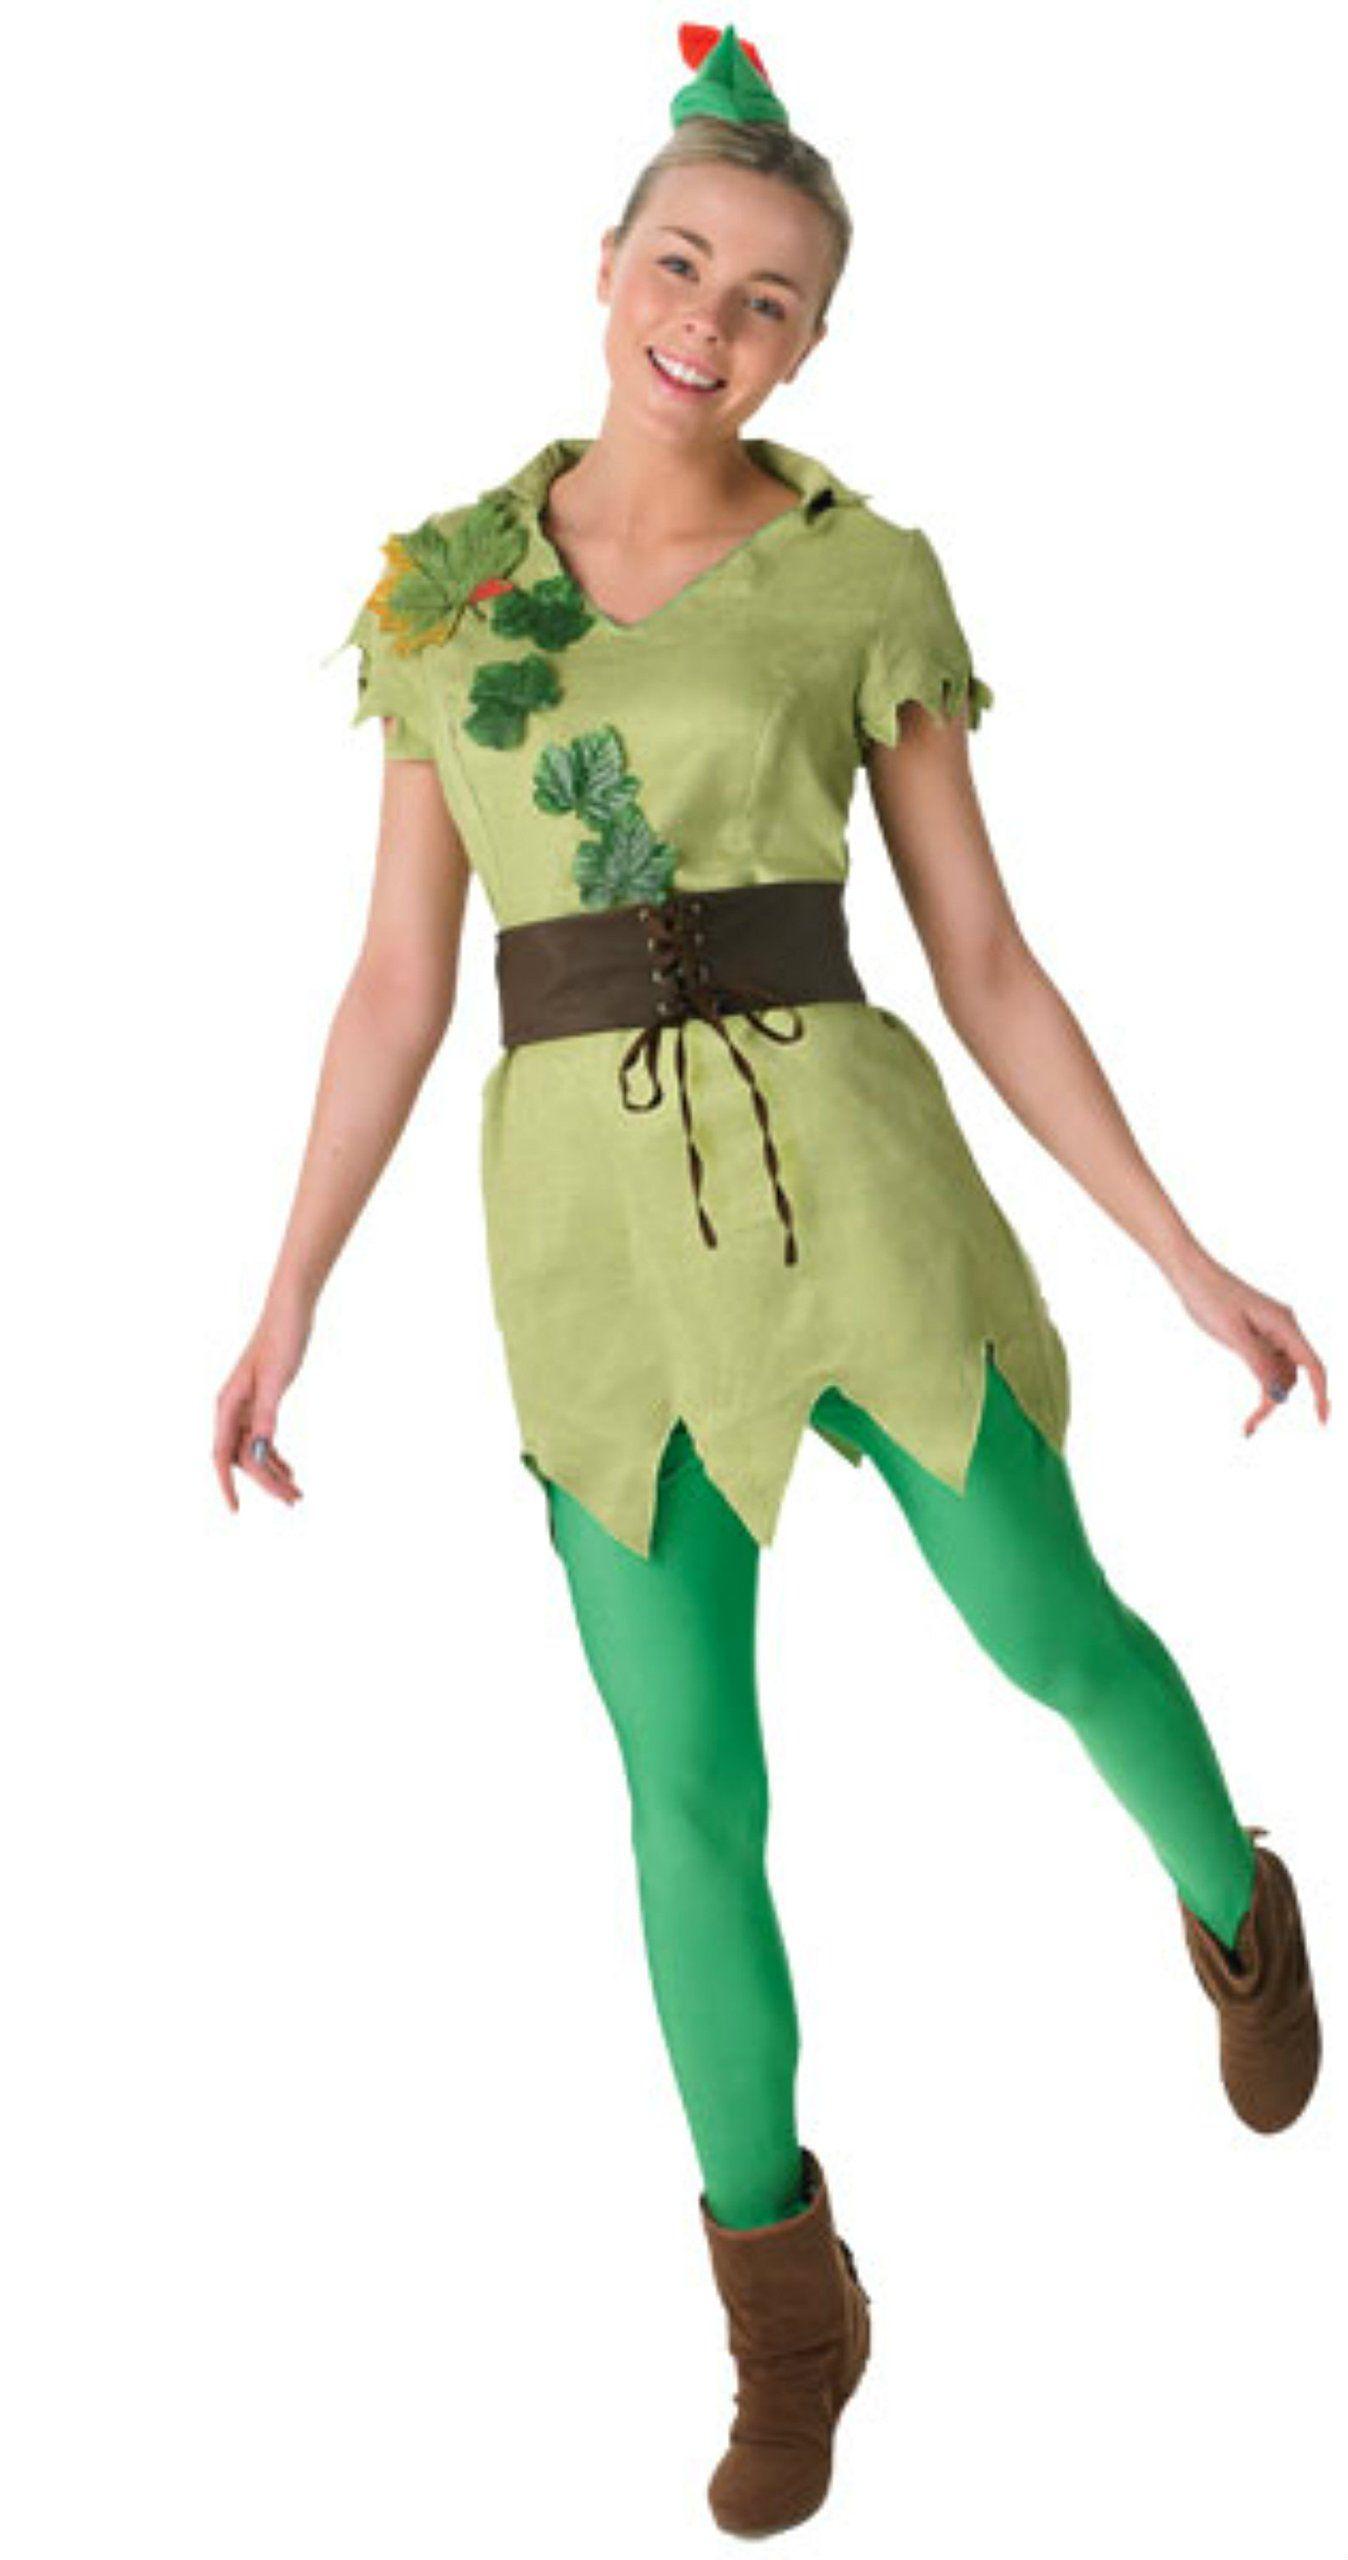 D guisement miss peter pan pour femme taille m d guisements pinterest peter pan - Theme de deguisement ...